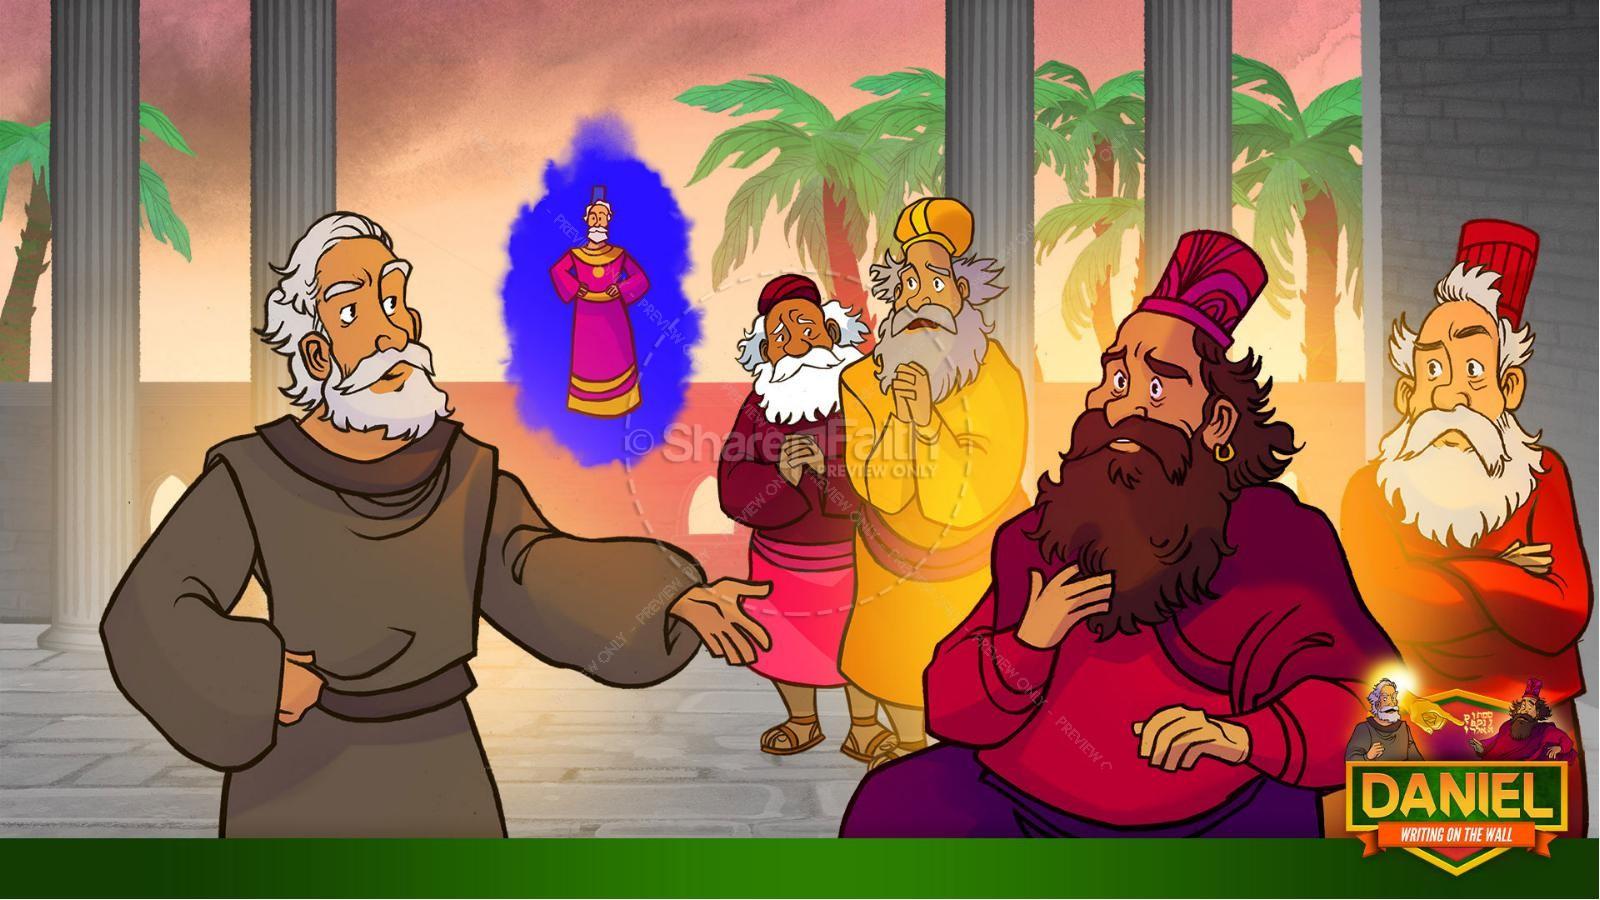 Daniel 5 Writing On The Wall Kids Bible Story | slide 22